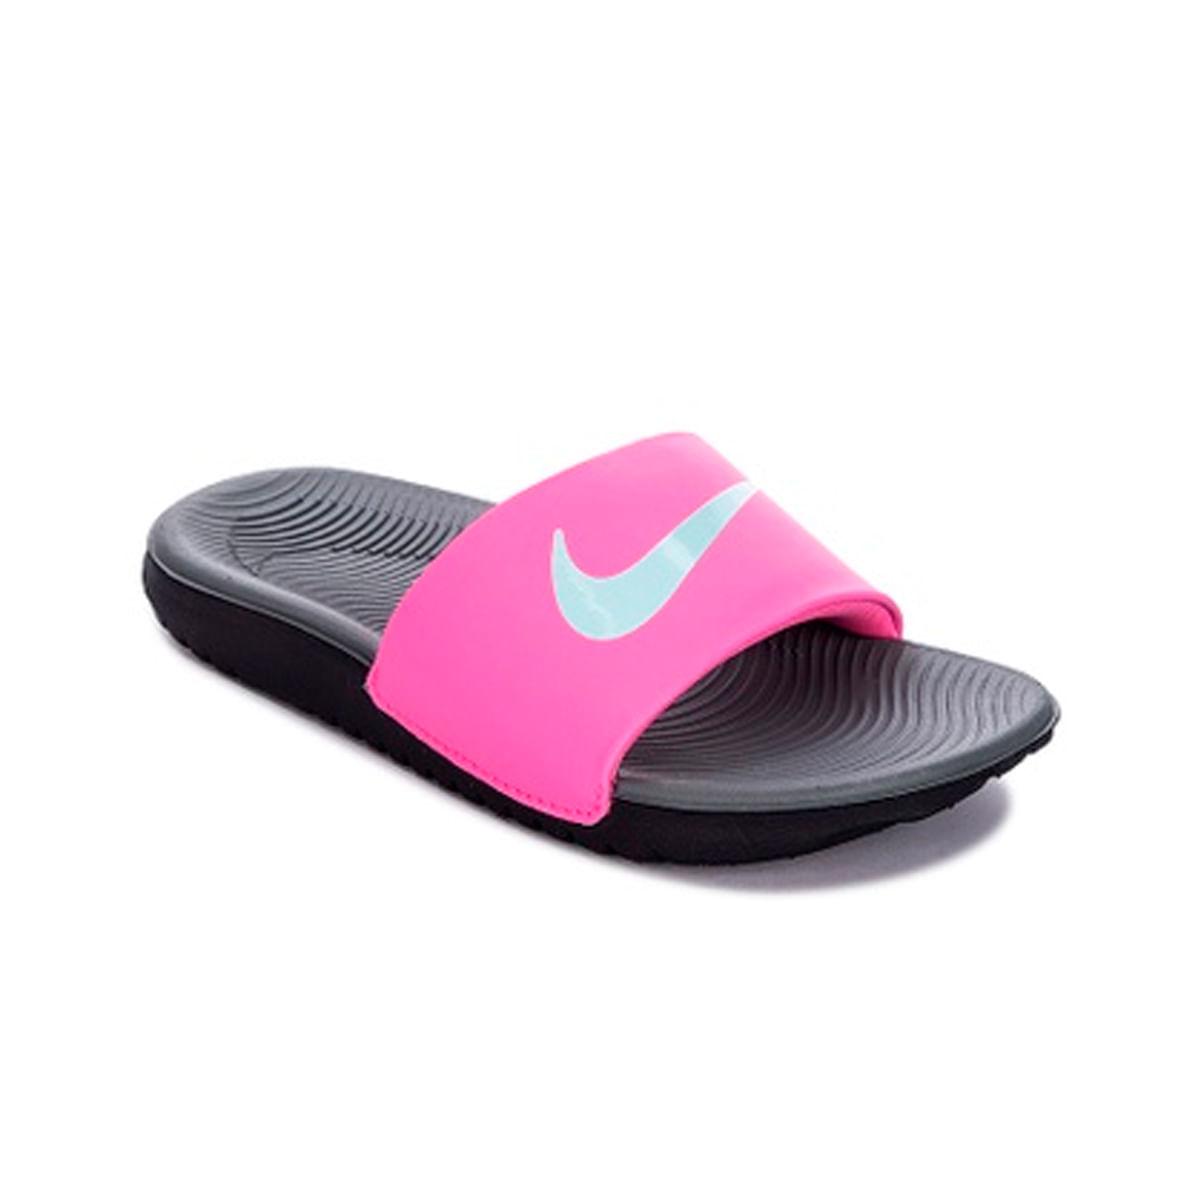 Slide-Infantil-Nike-Kawa--27-ao-375--819352-604--1Q21-